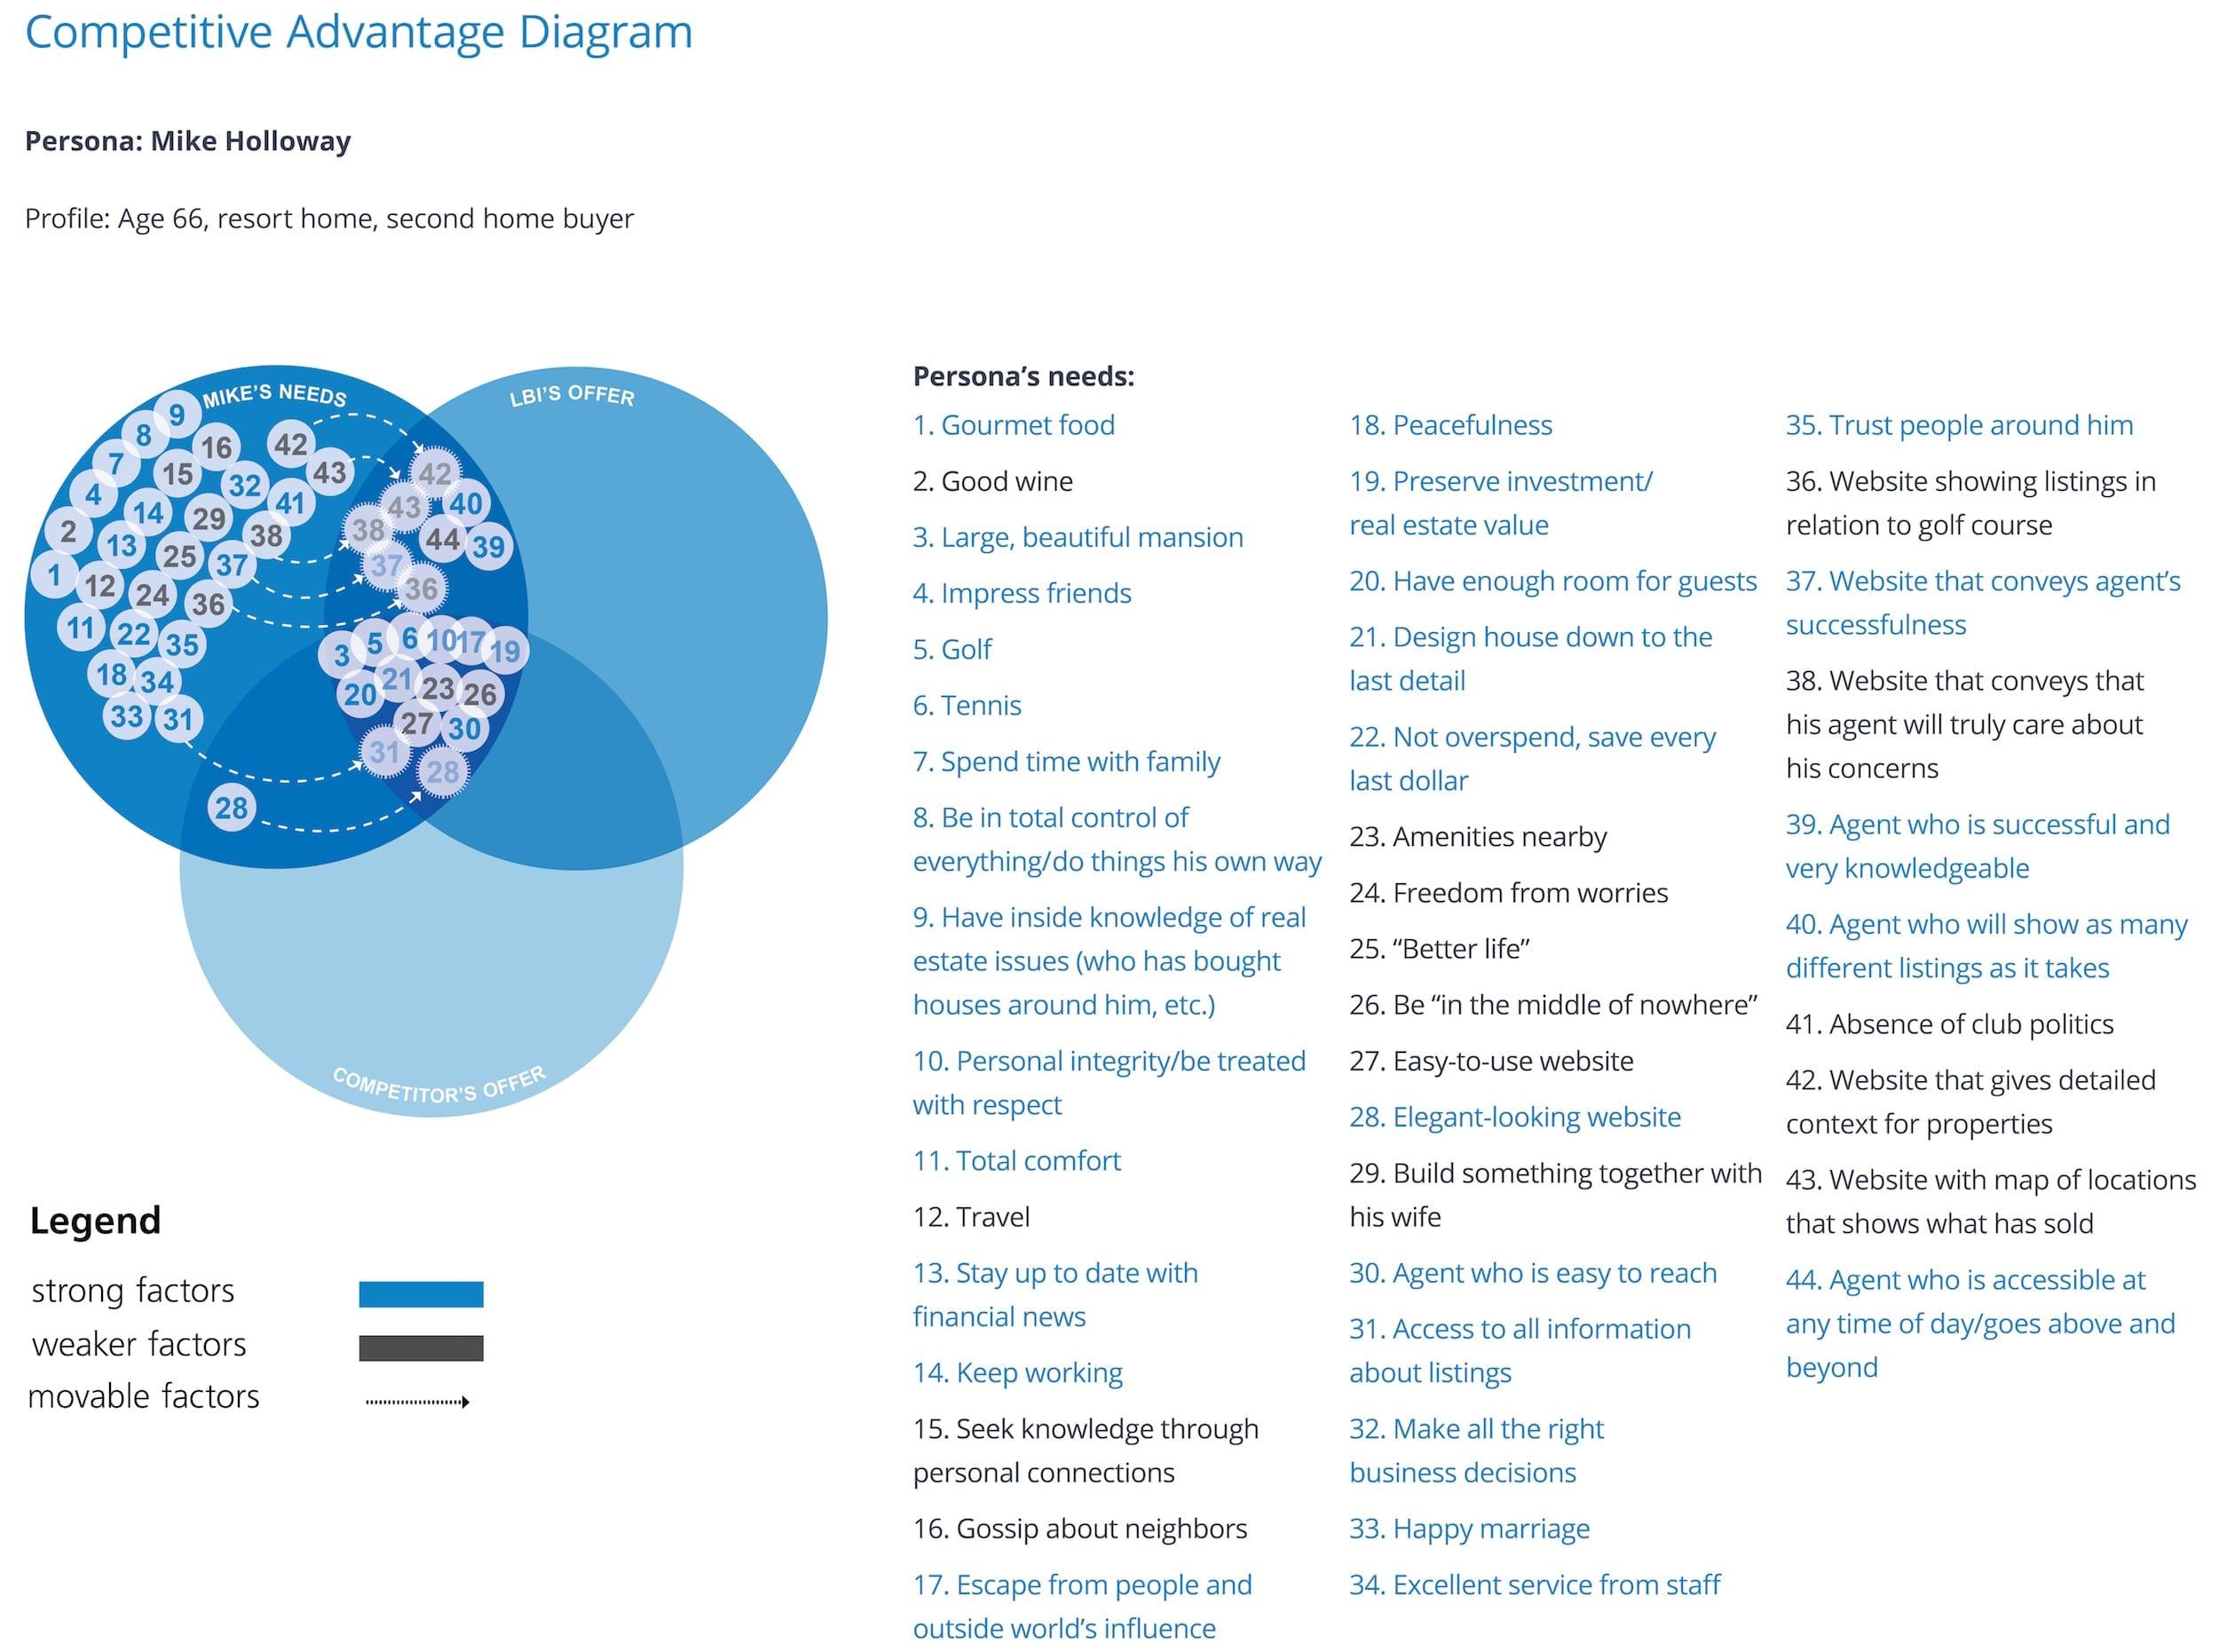 LBI Competitive Advantage Diagram